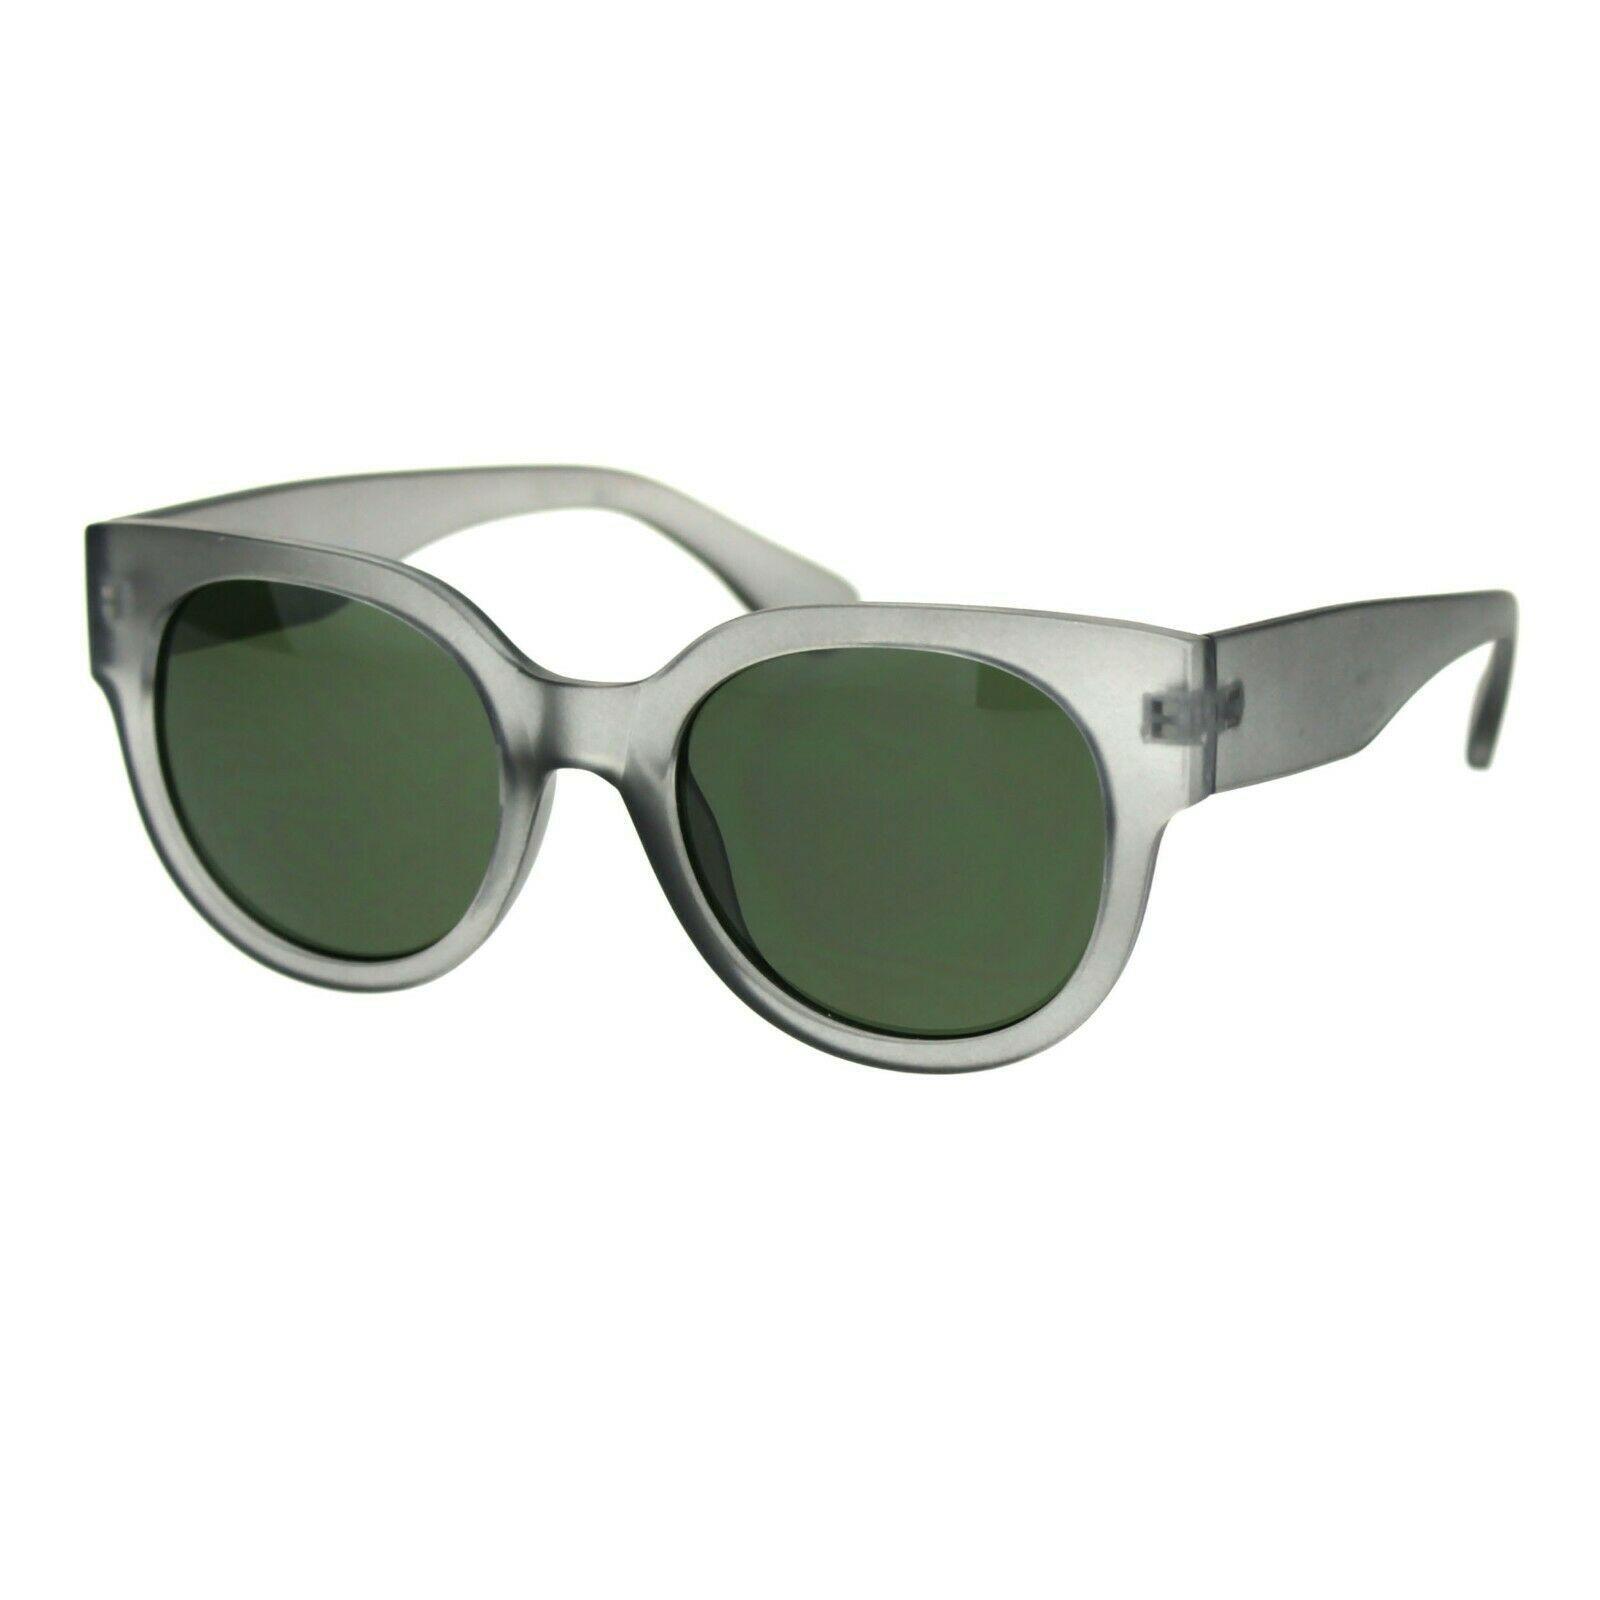 Womens Round Horn Rim Sunglasses Trendy Retro Fashion Shades UV 400 image 4